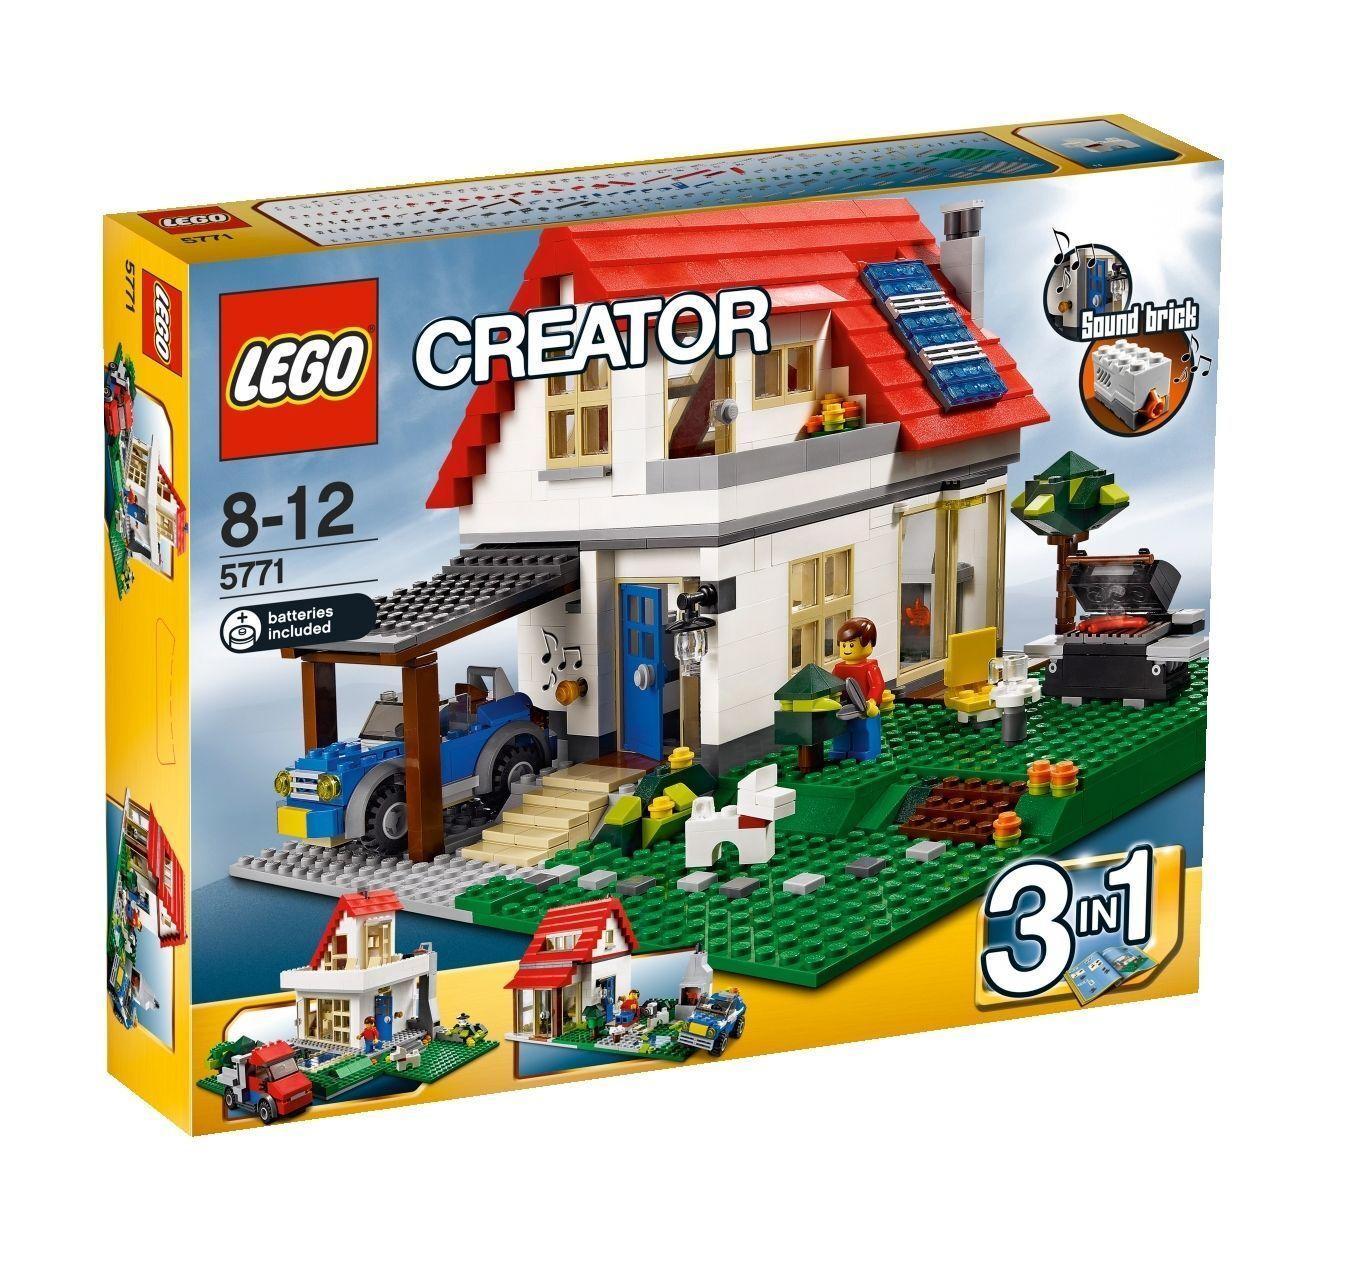 LEGO Creator Creator Creator Villa (5771) 3-in-1- Modell mit Sound Brick - Rarität  NEU & OVP ef3e0f